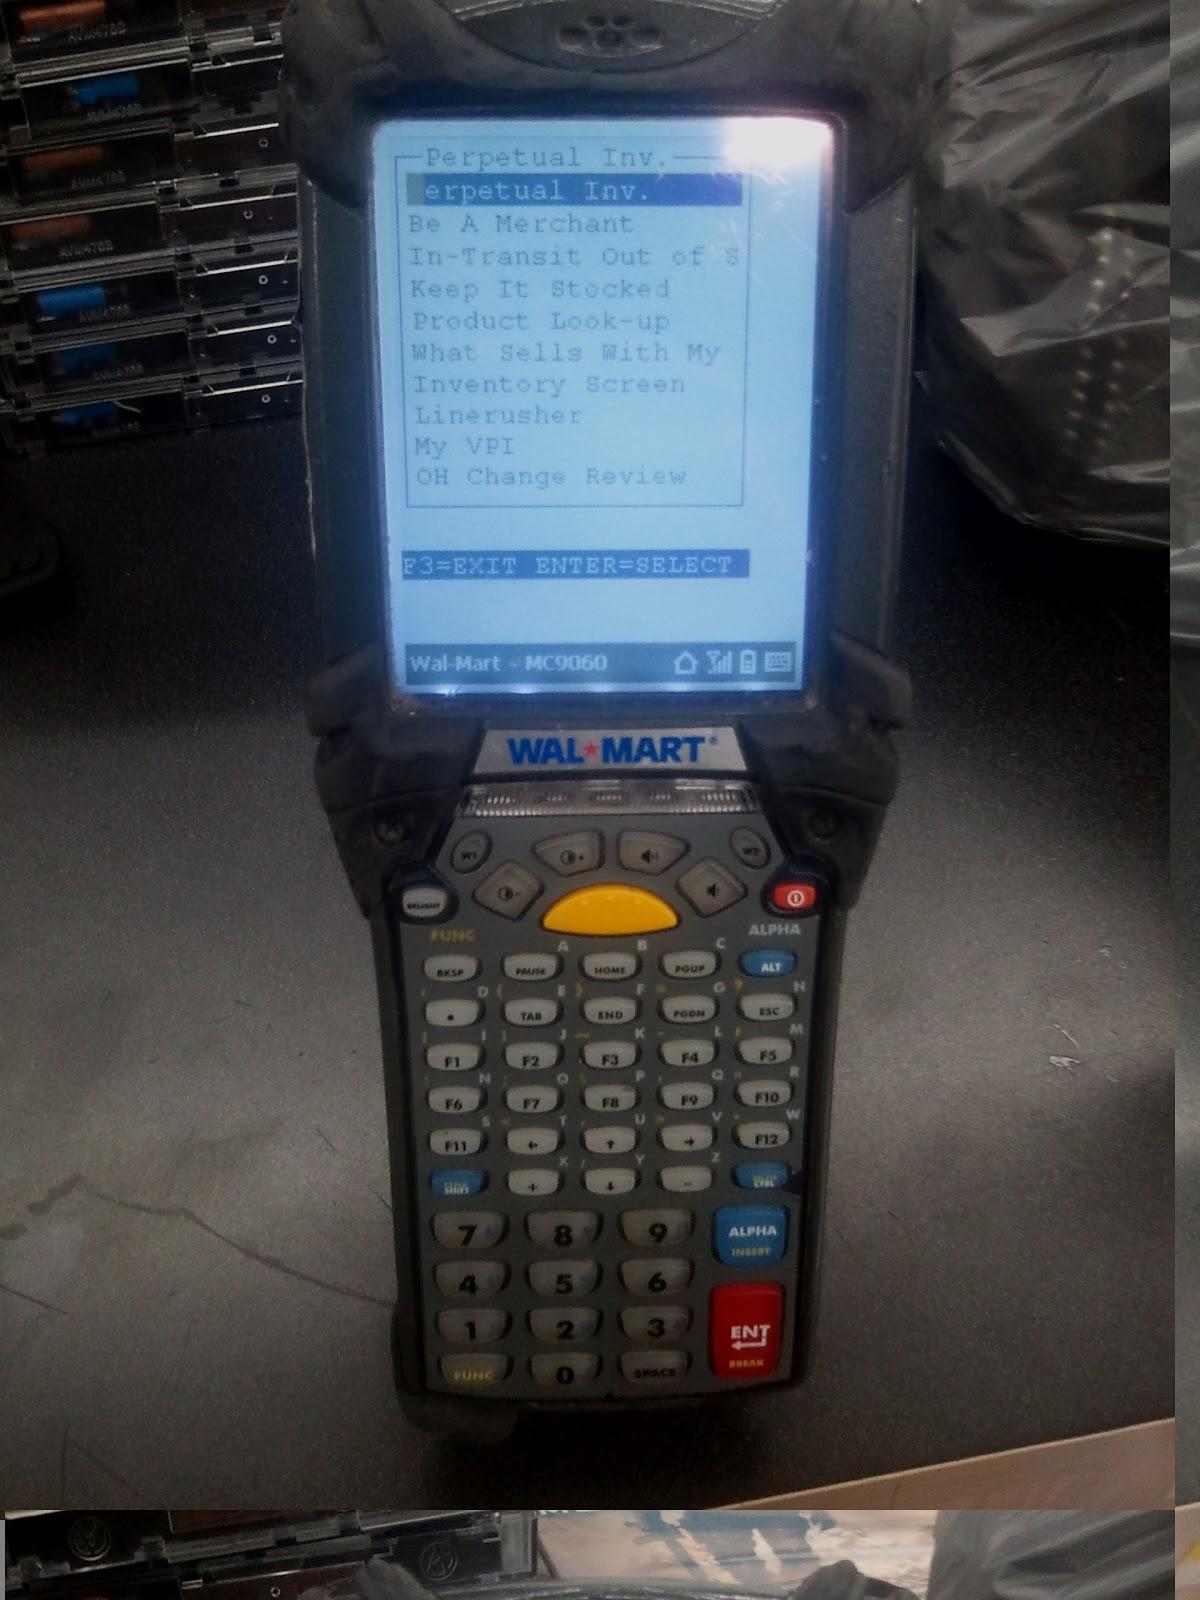 Wal Mart Information System